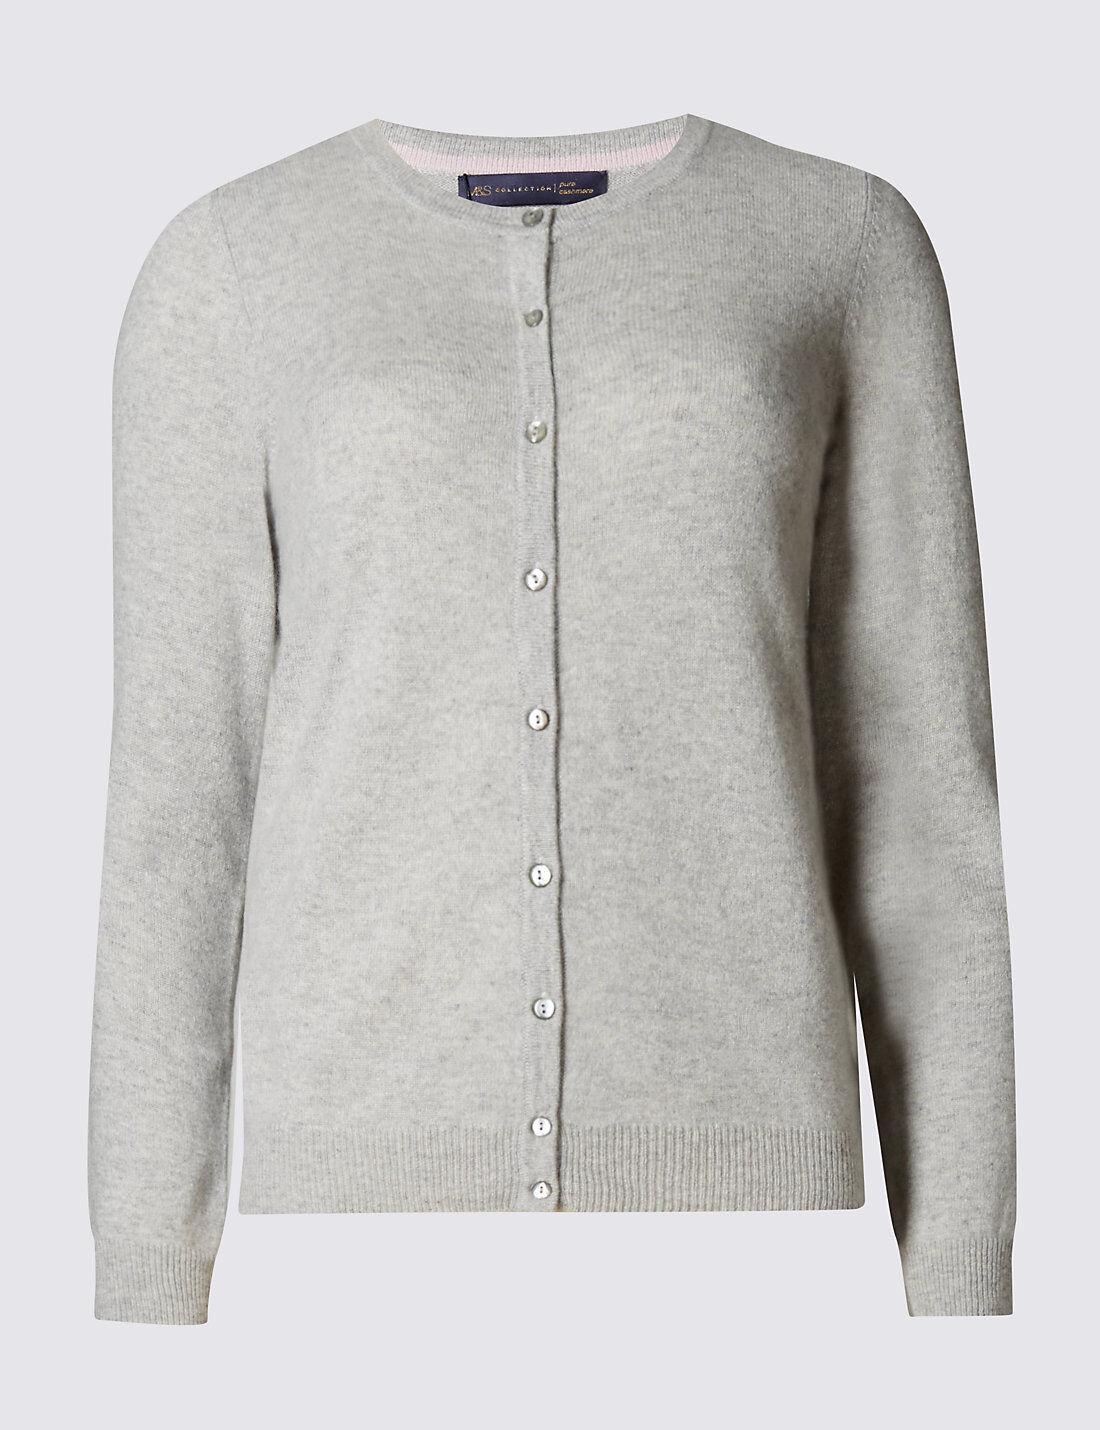 Pure cashmere grey M&S size 12 cardigan BNWT